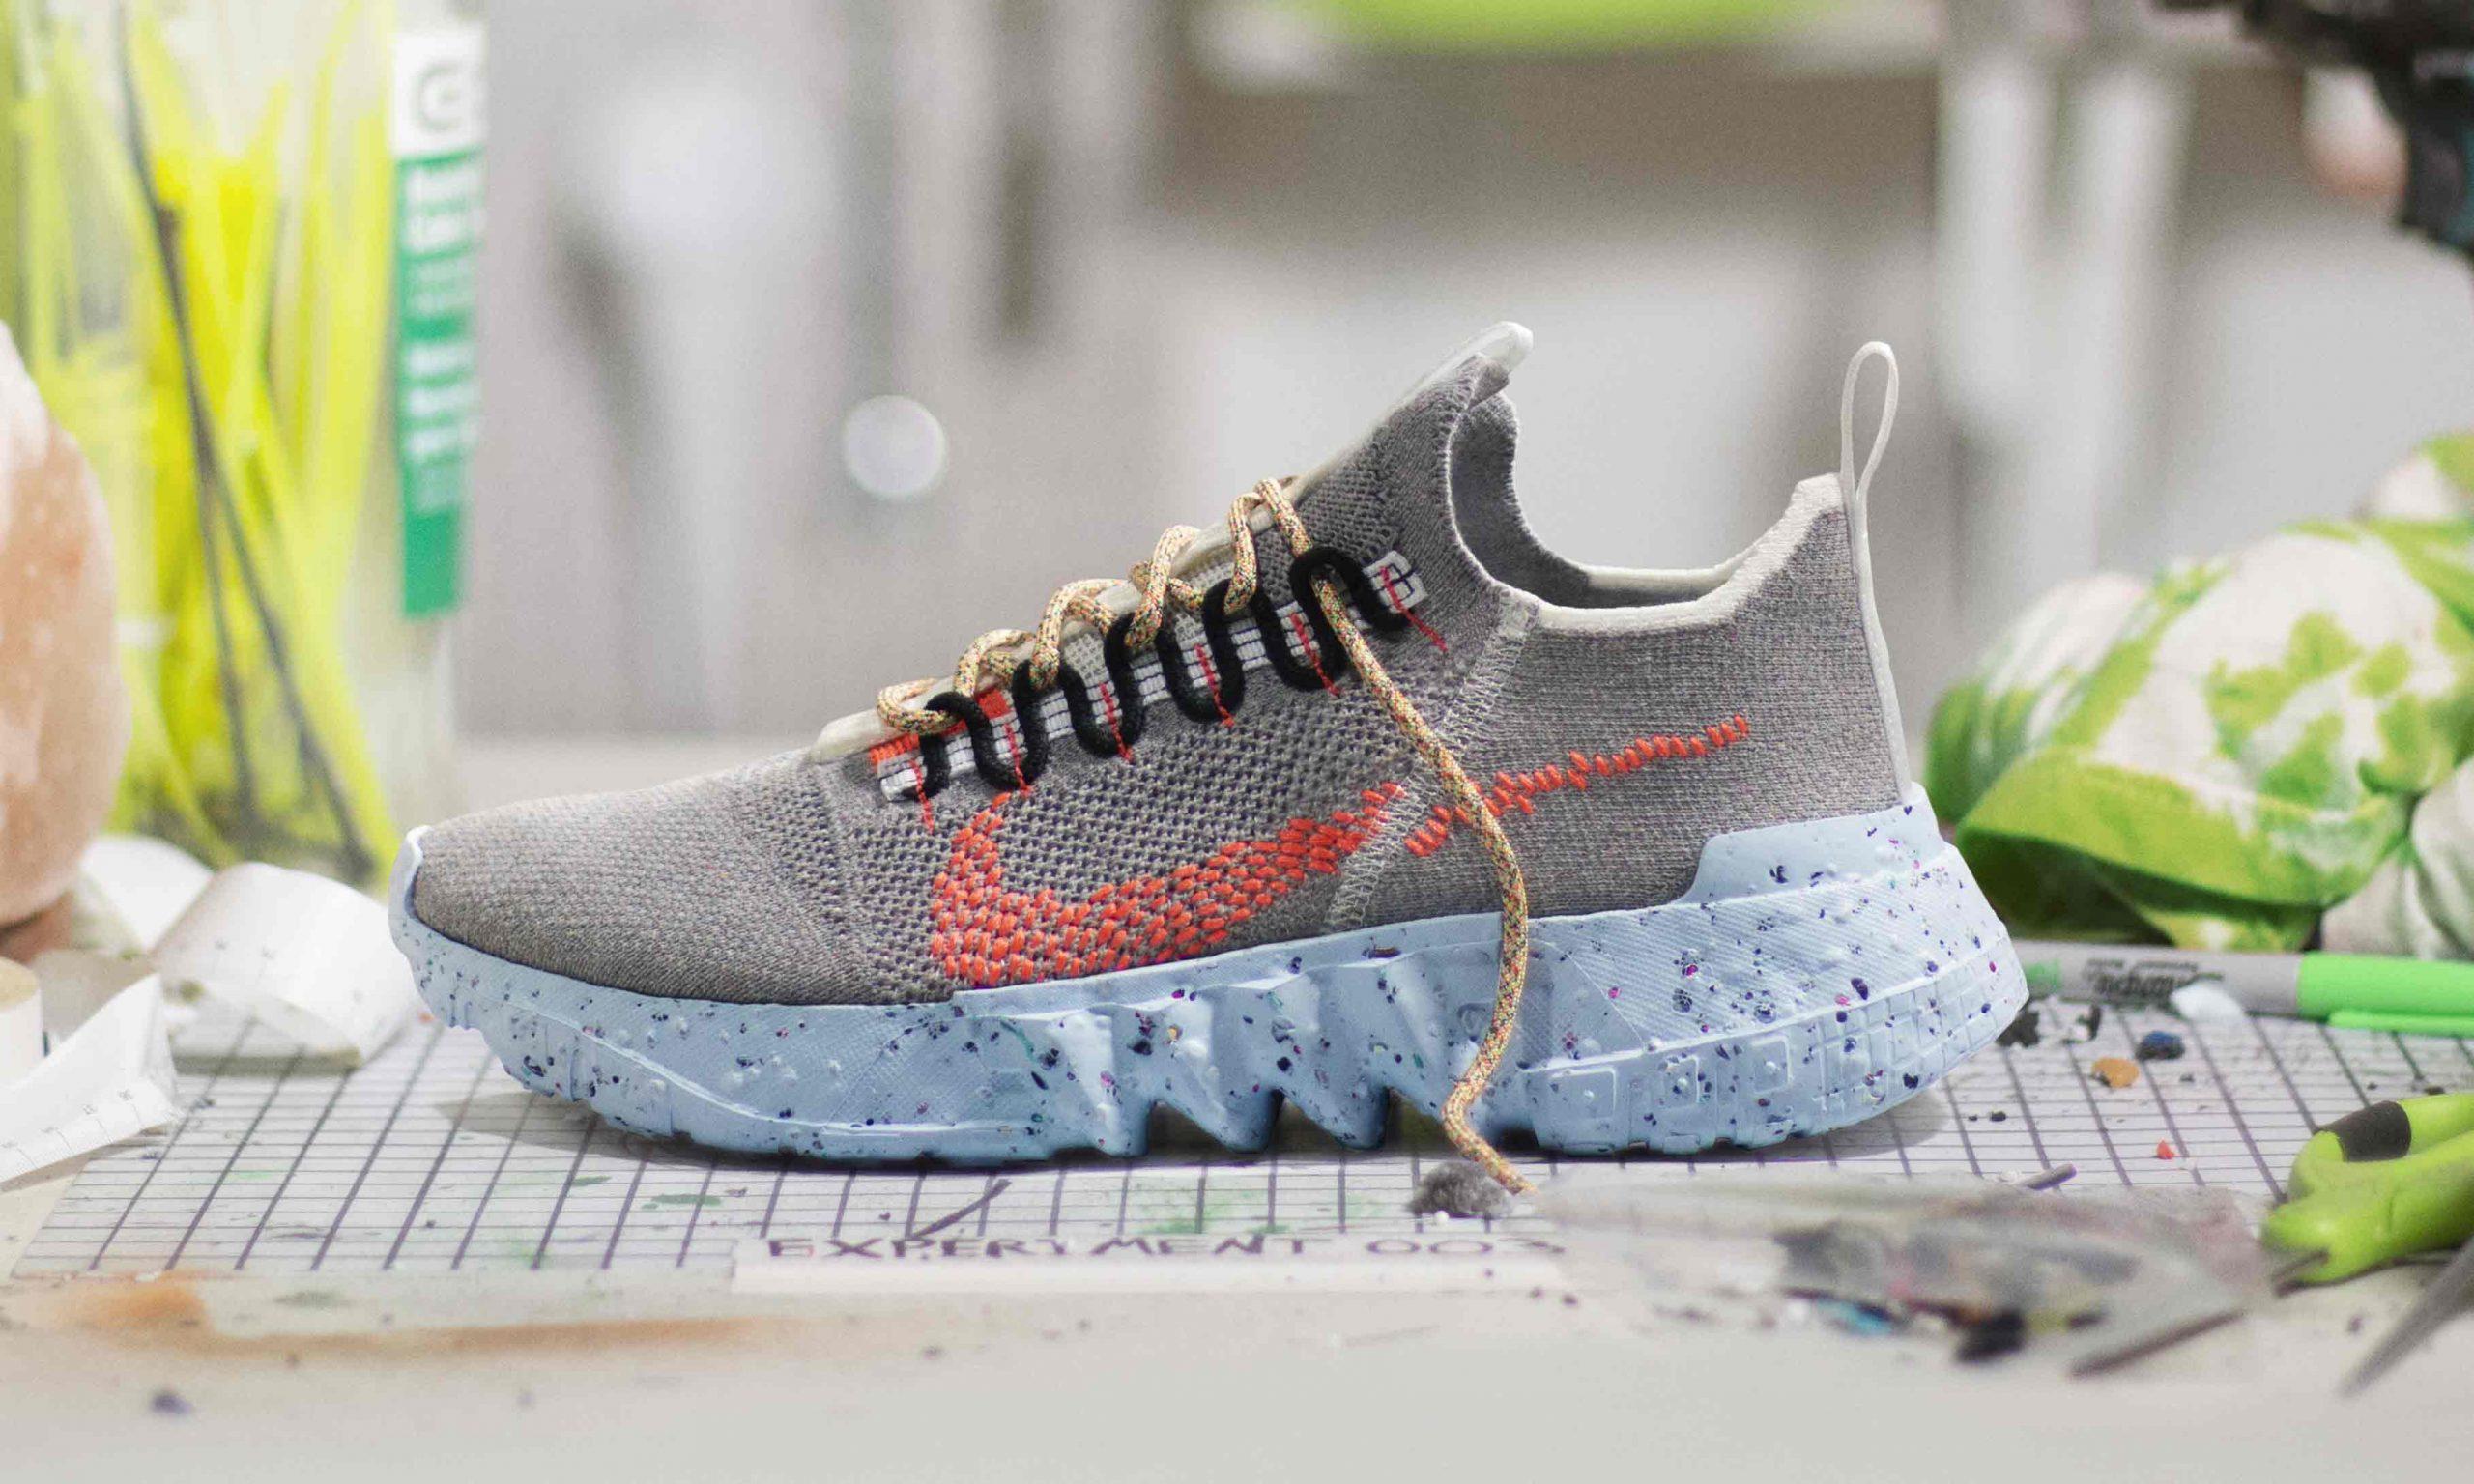 Nike Space Hippie 系列鞋款发售日期确定